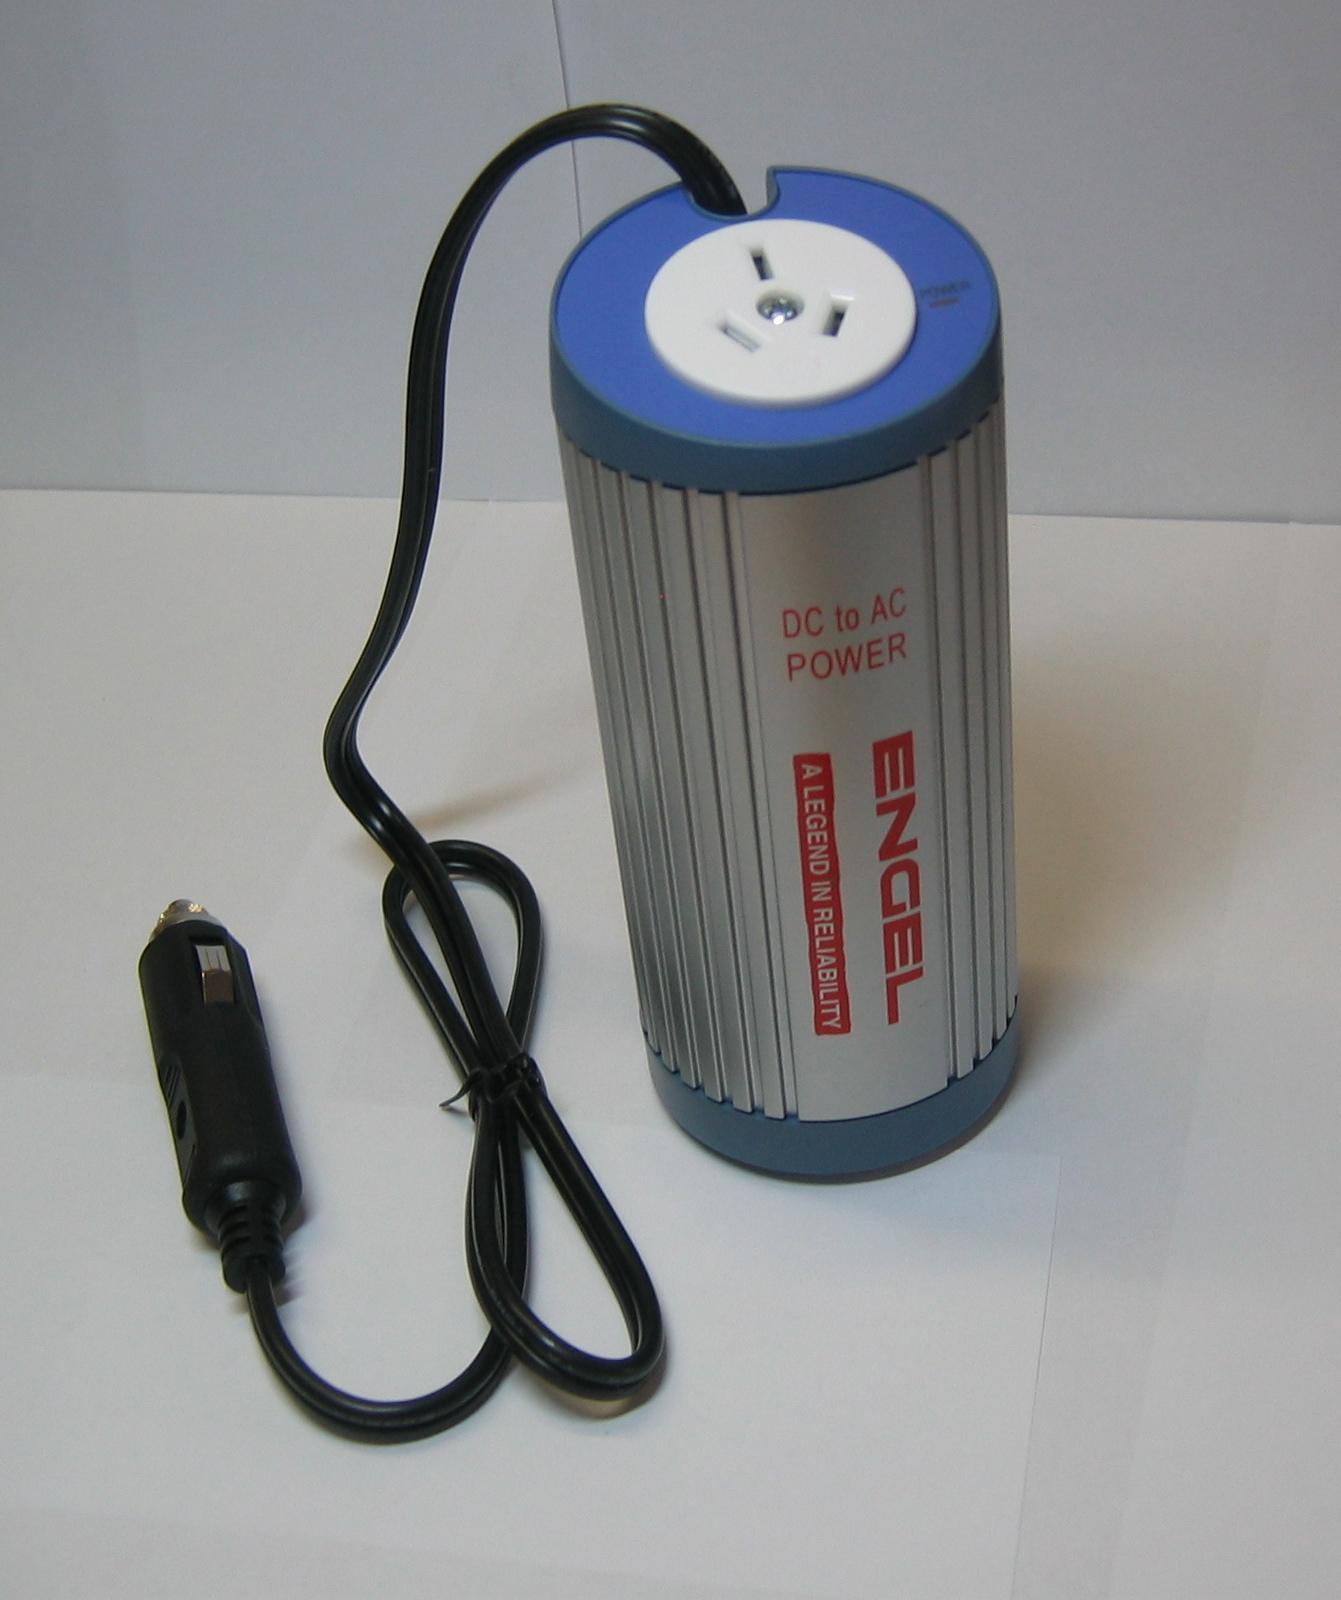 Engeland Engel Portable Fridge Freezer Sales Hire Parts Repairs 12 Volt Dc To Ac Power Inverter Canverter 240 Item Add Cart View